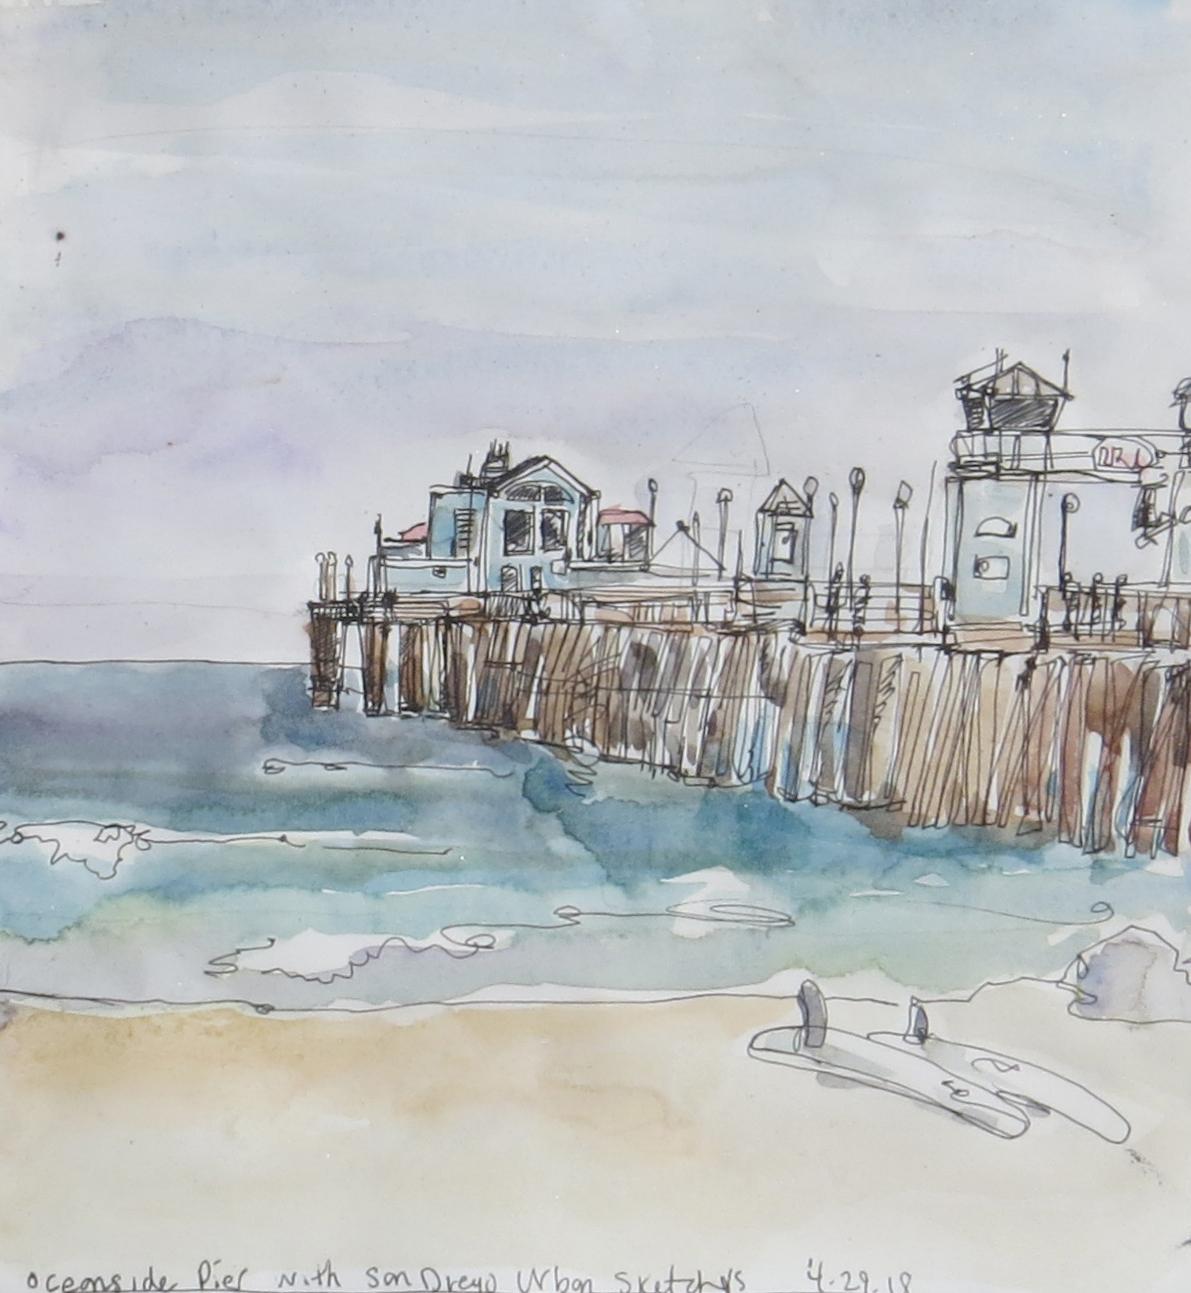 Oceanside Pier, with San Diego Urban Sketchers | Urban Sketchers